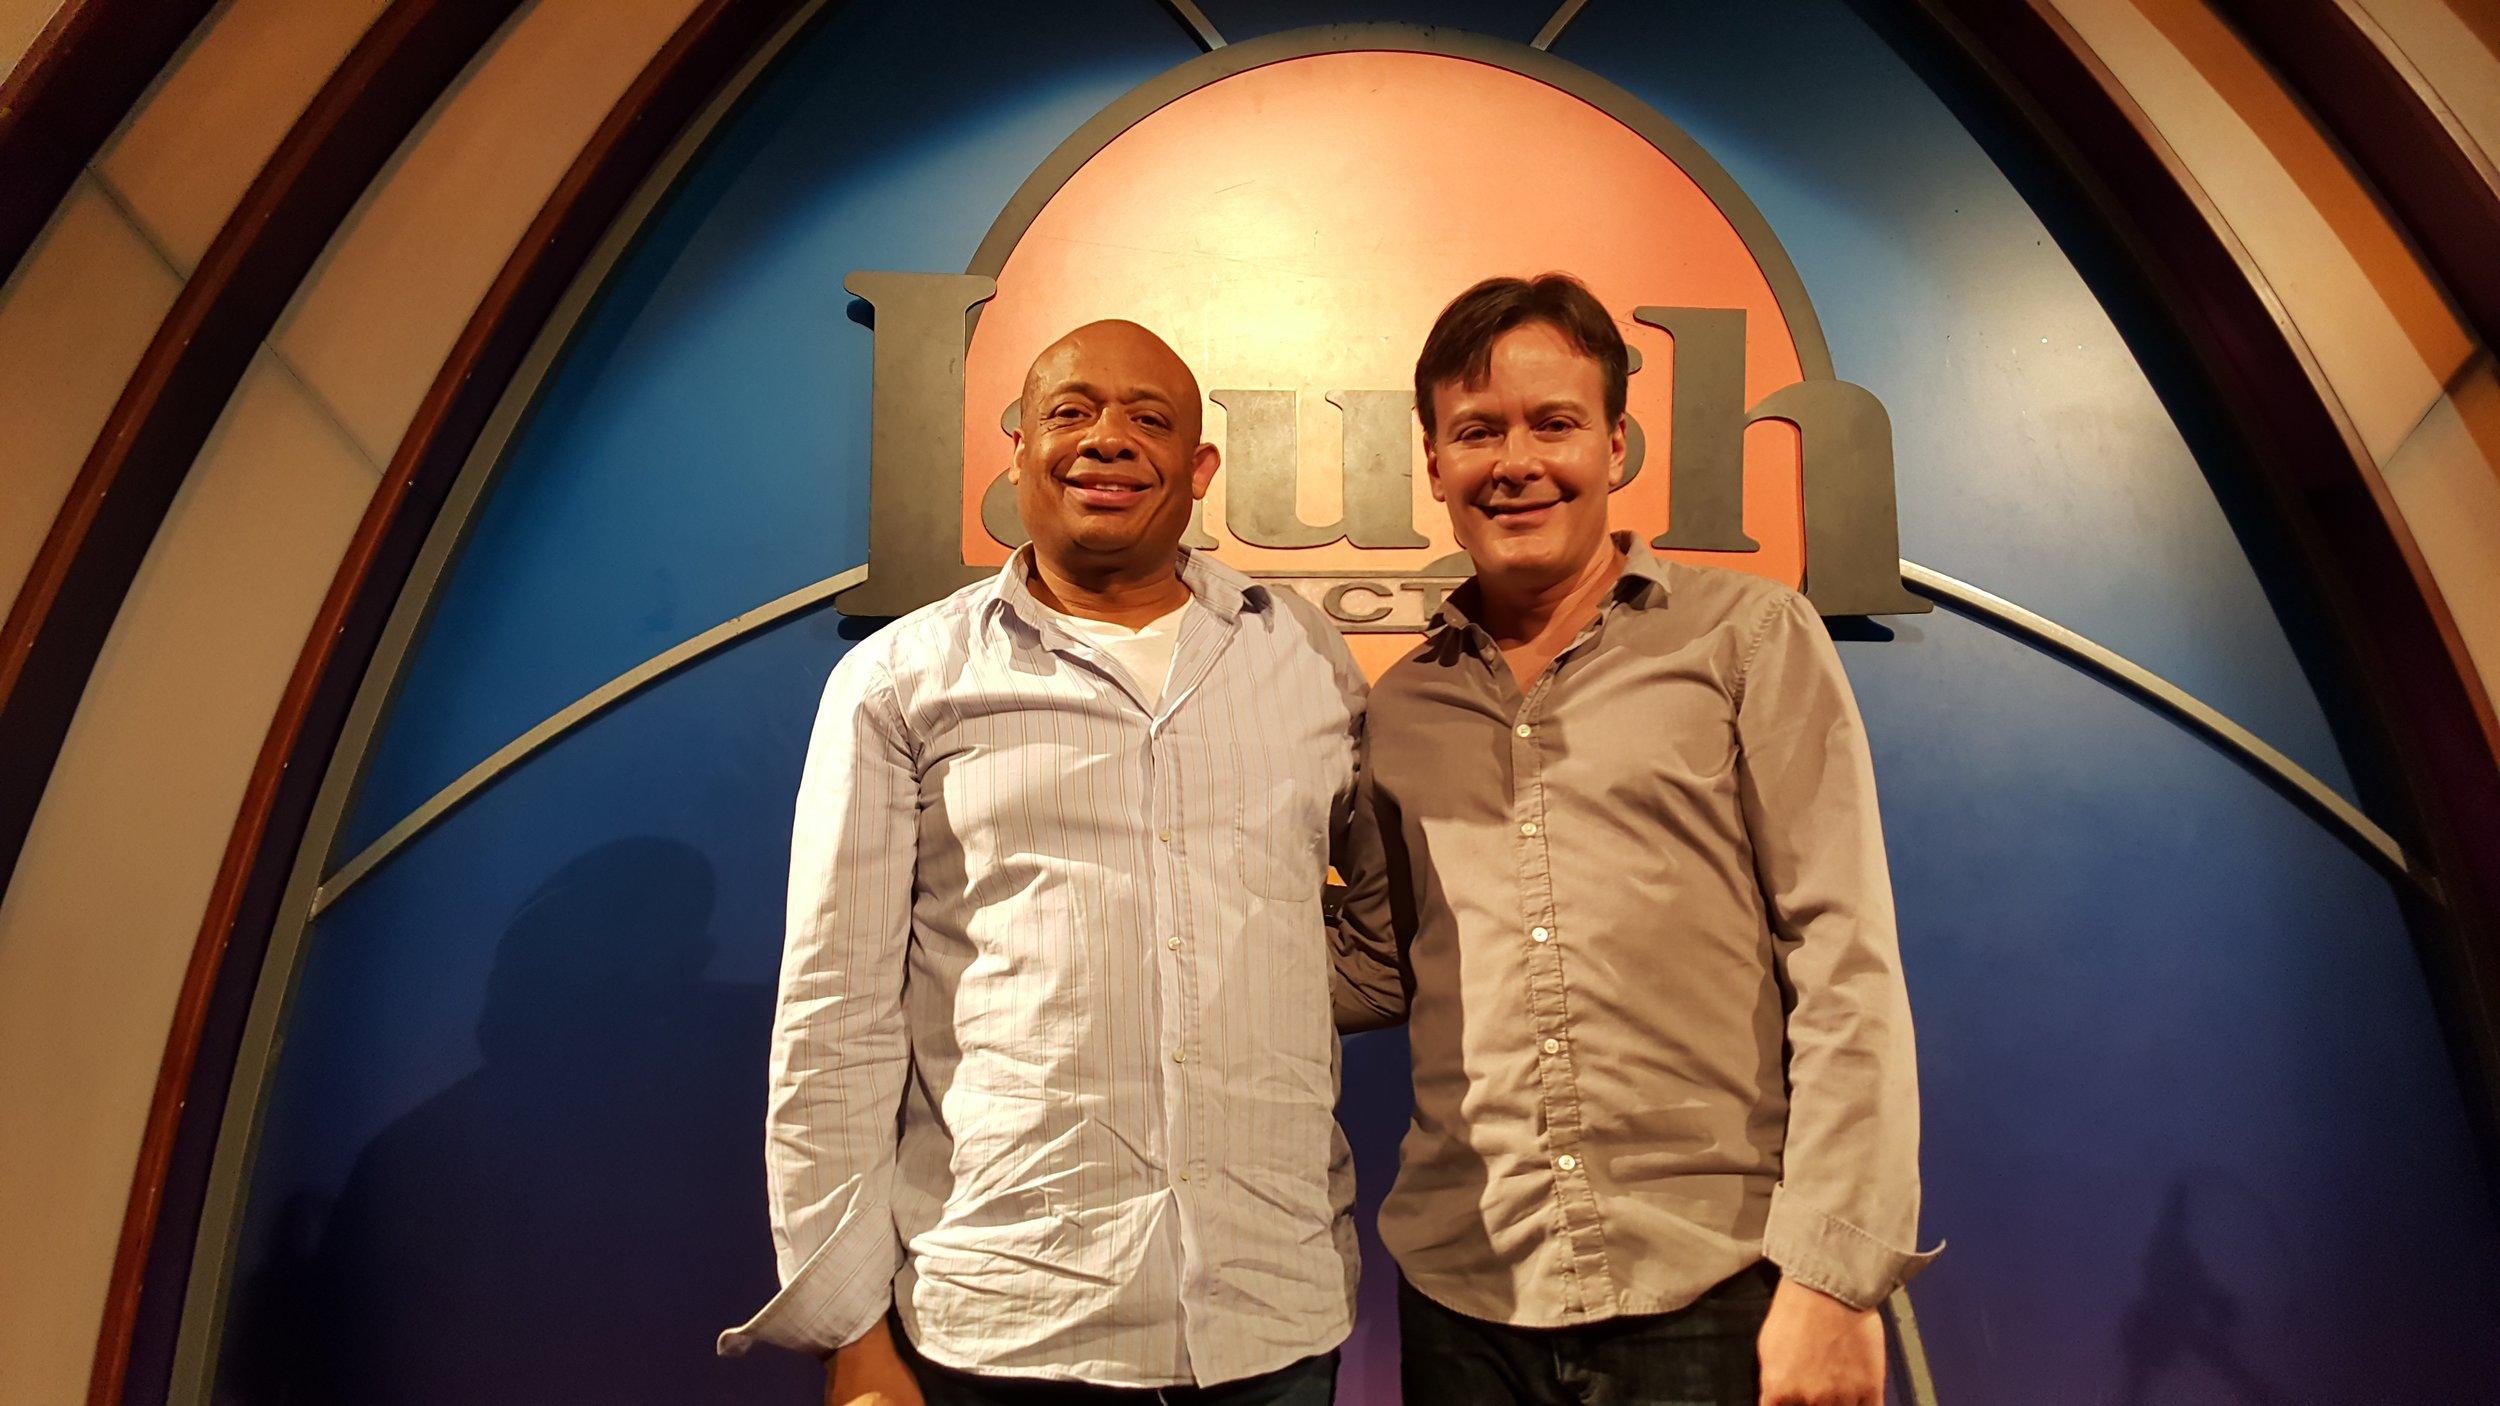 Michael Alexander with Greg Glienna